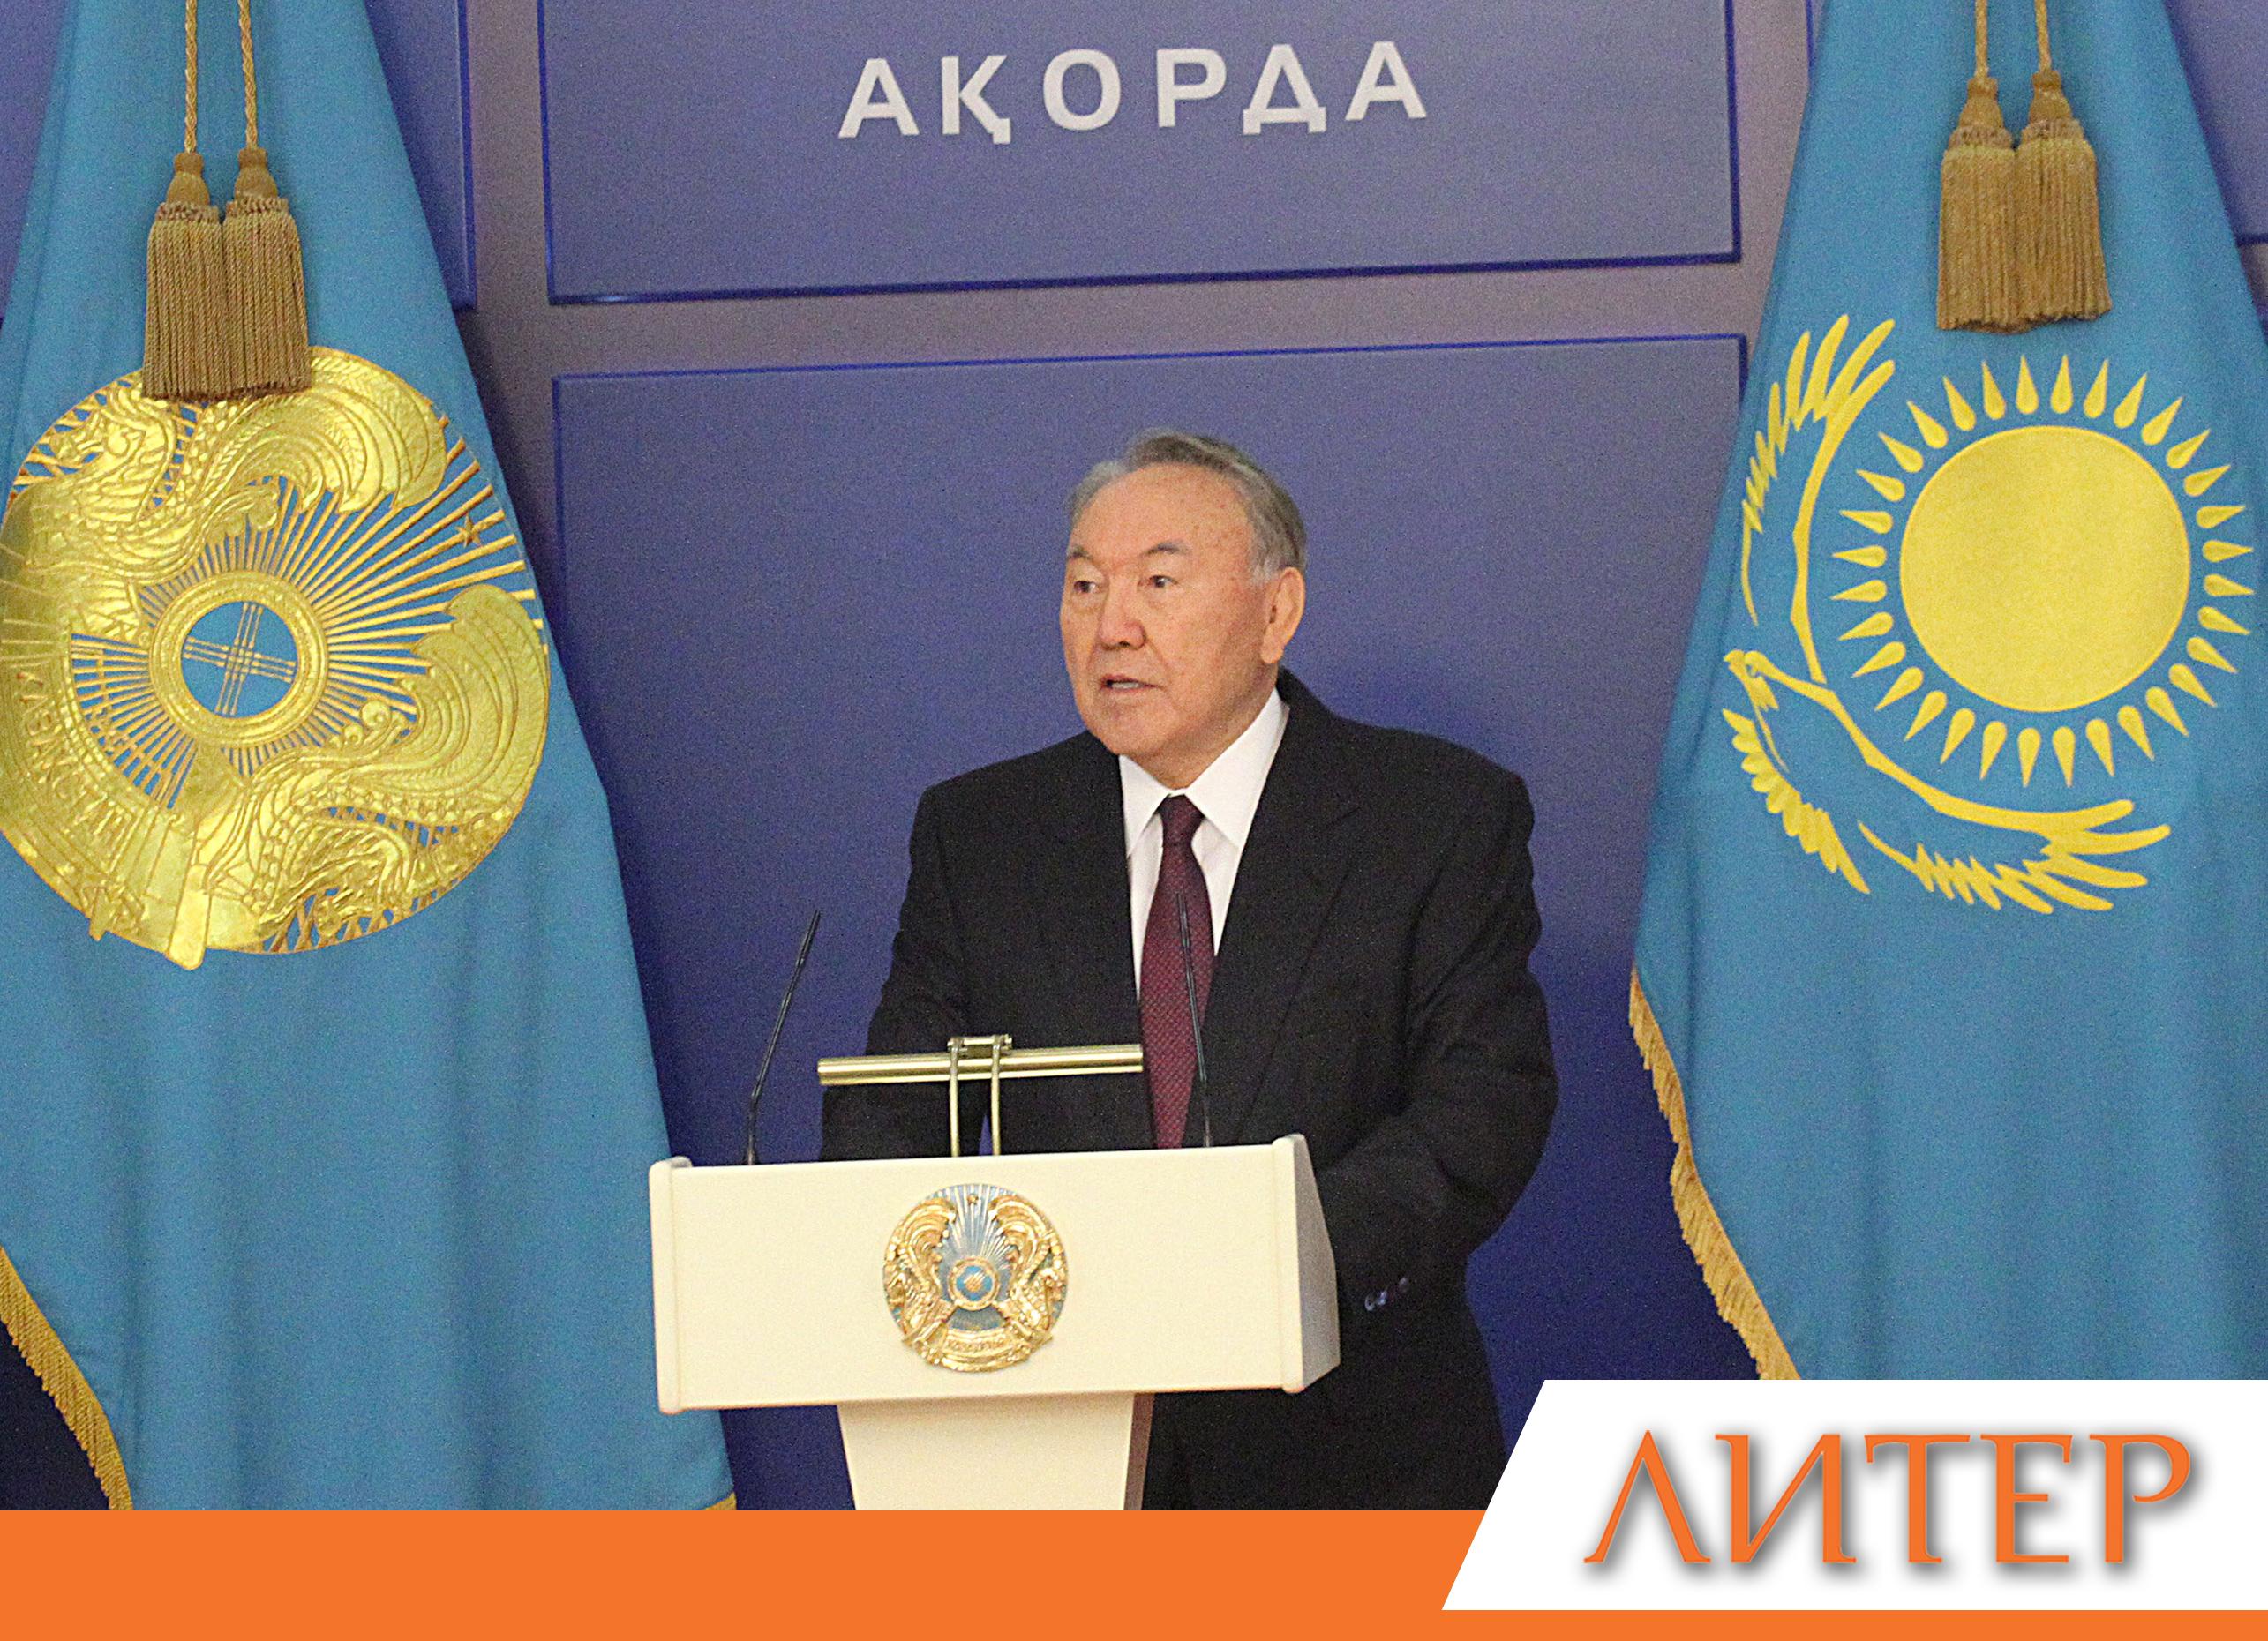 Нурсултан Назарбаев отправил телеграмму Владимиру Путину